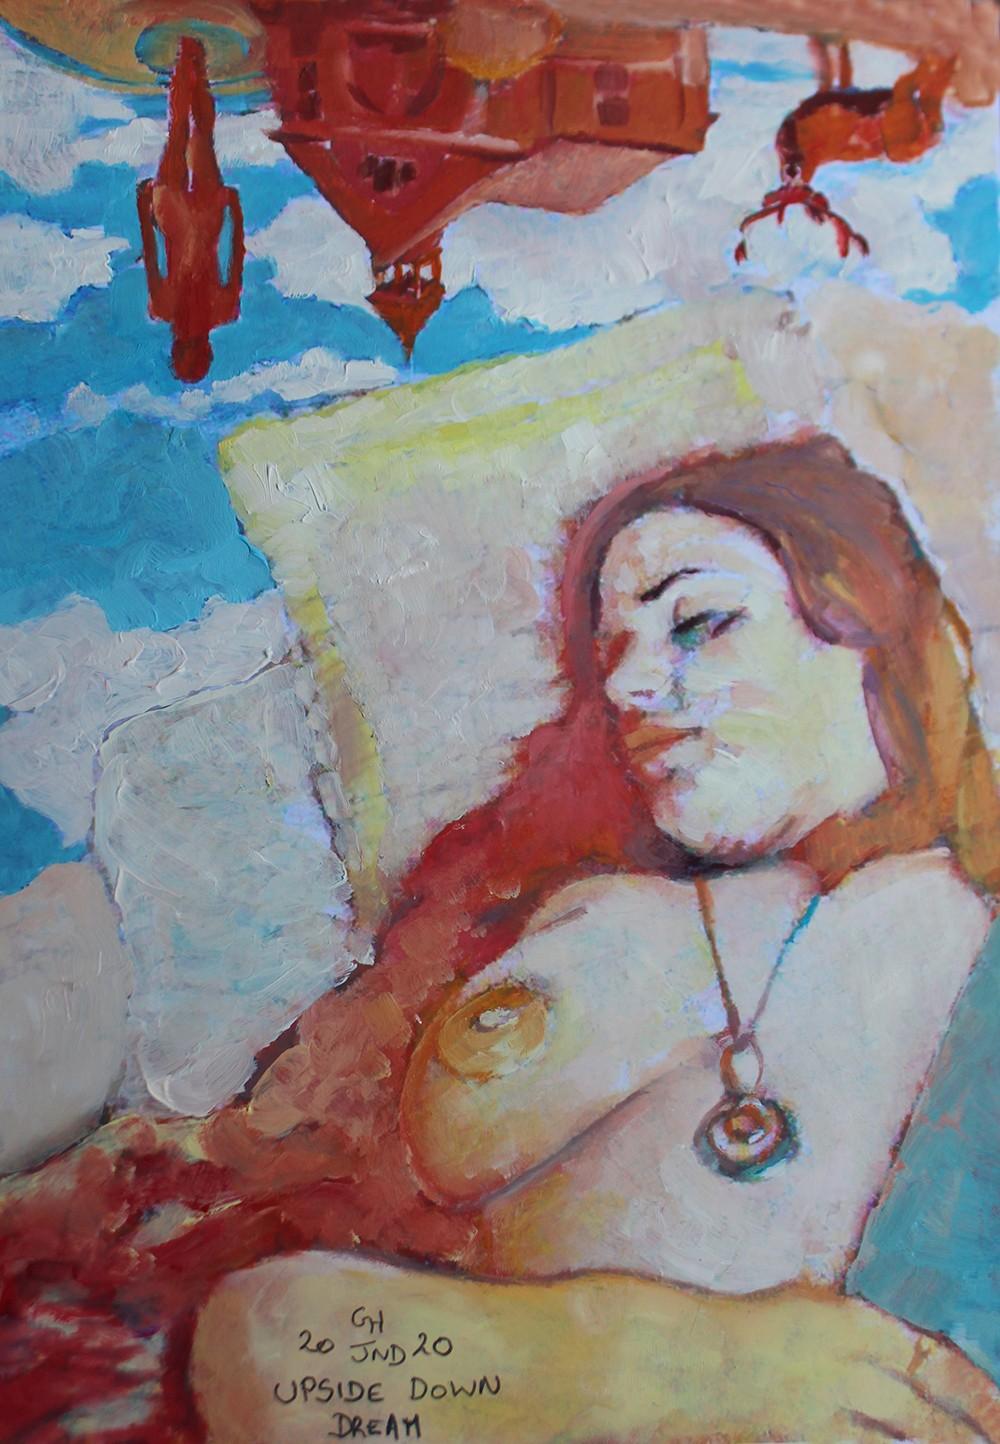 12. Upside Down Dream - Grégory Huck